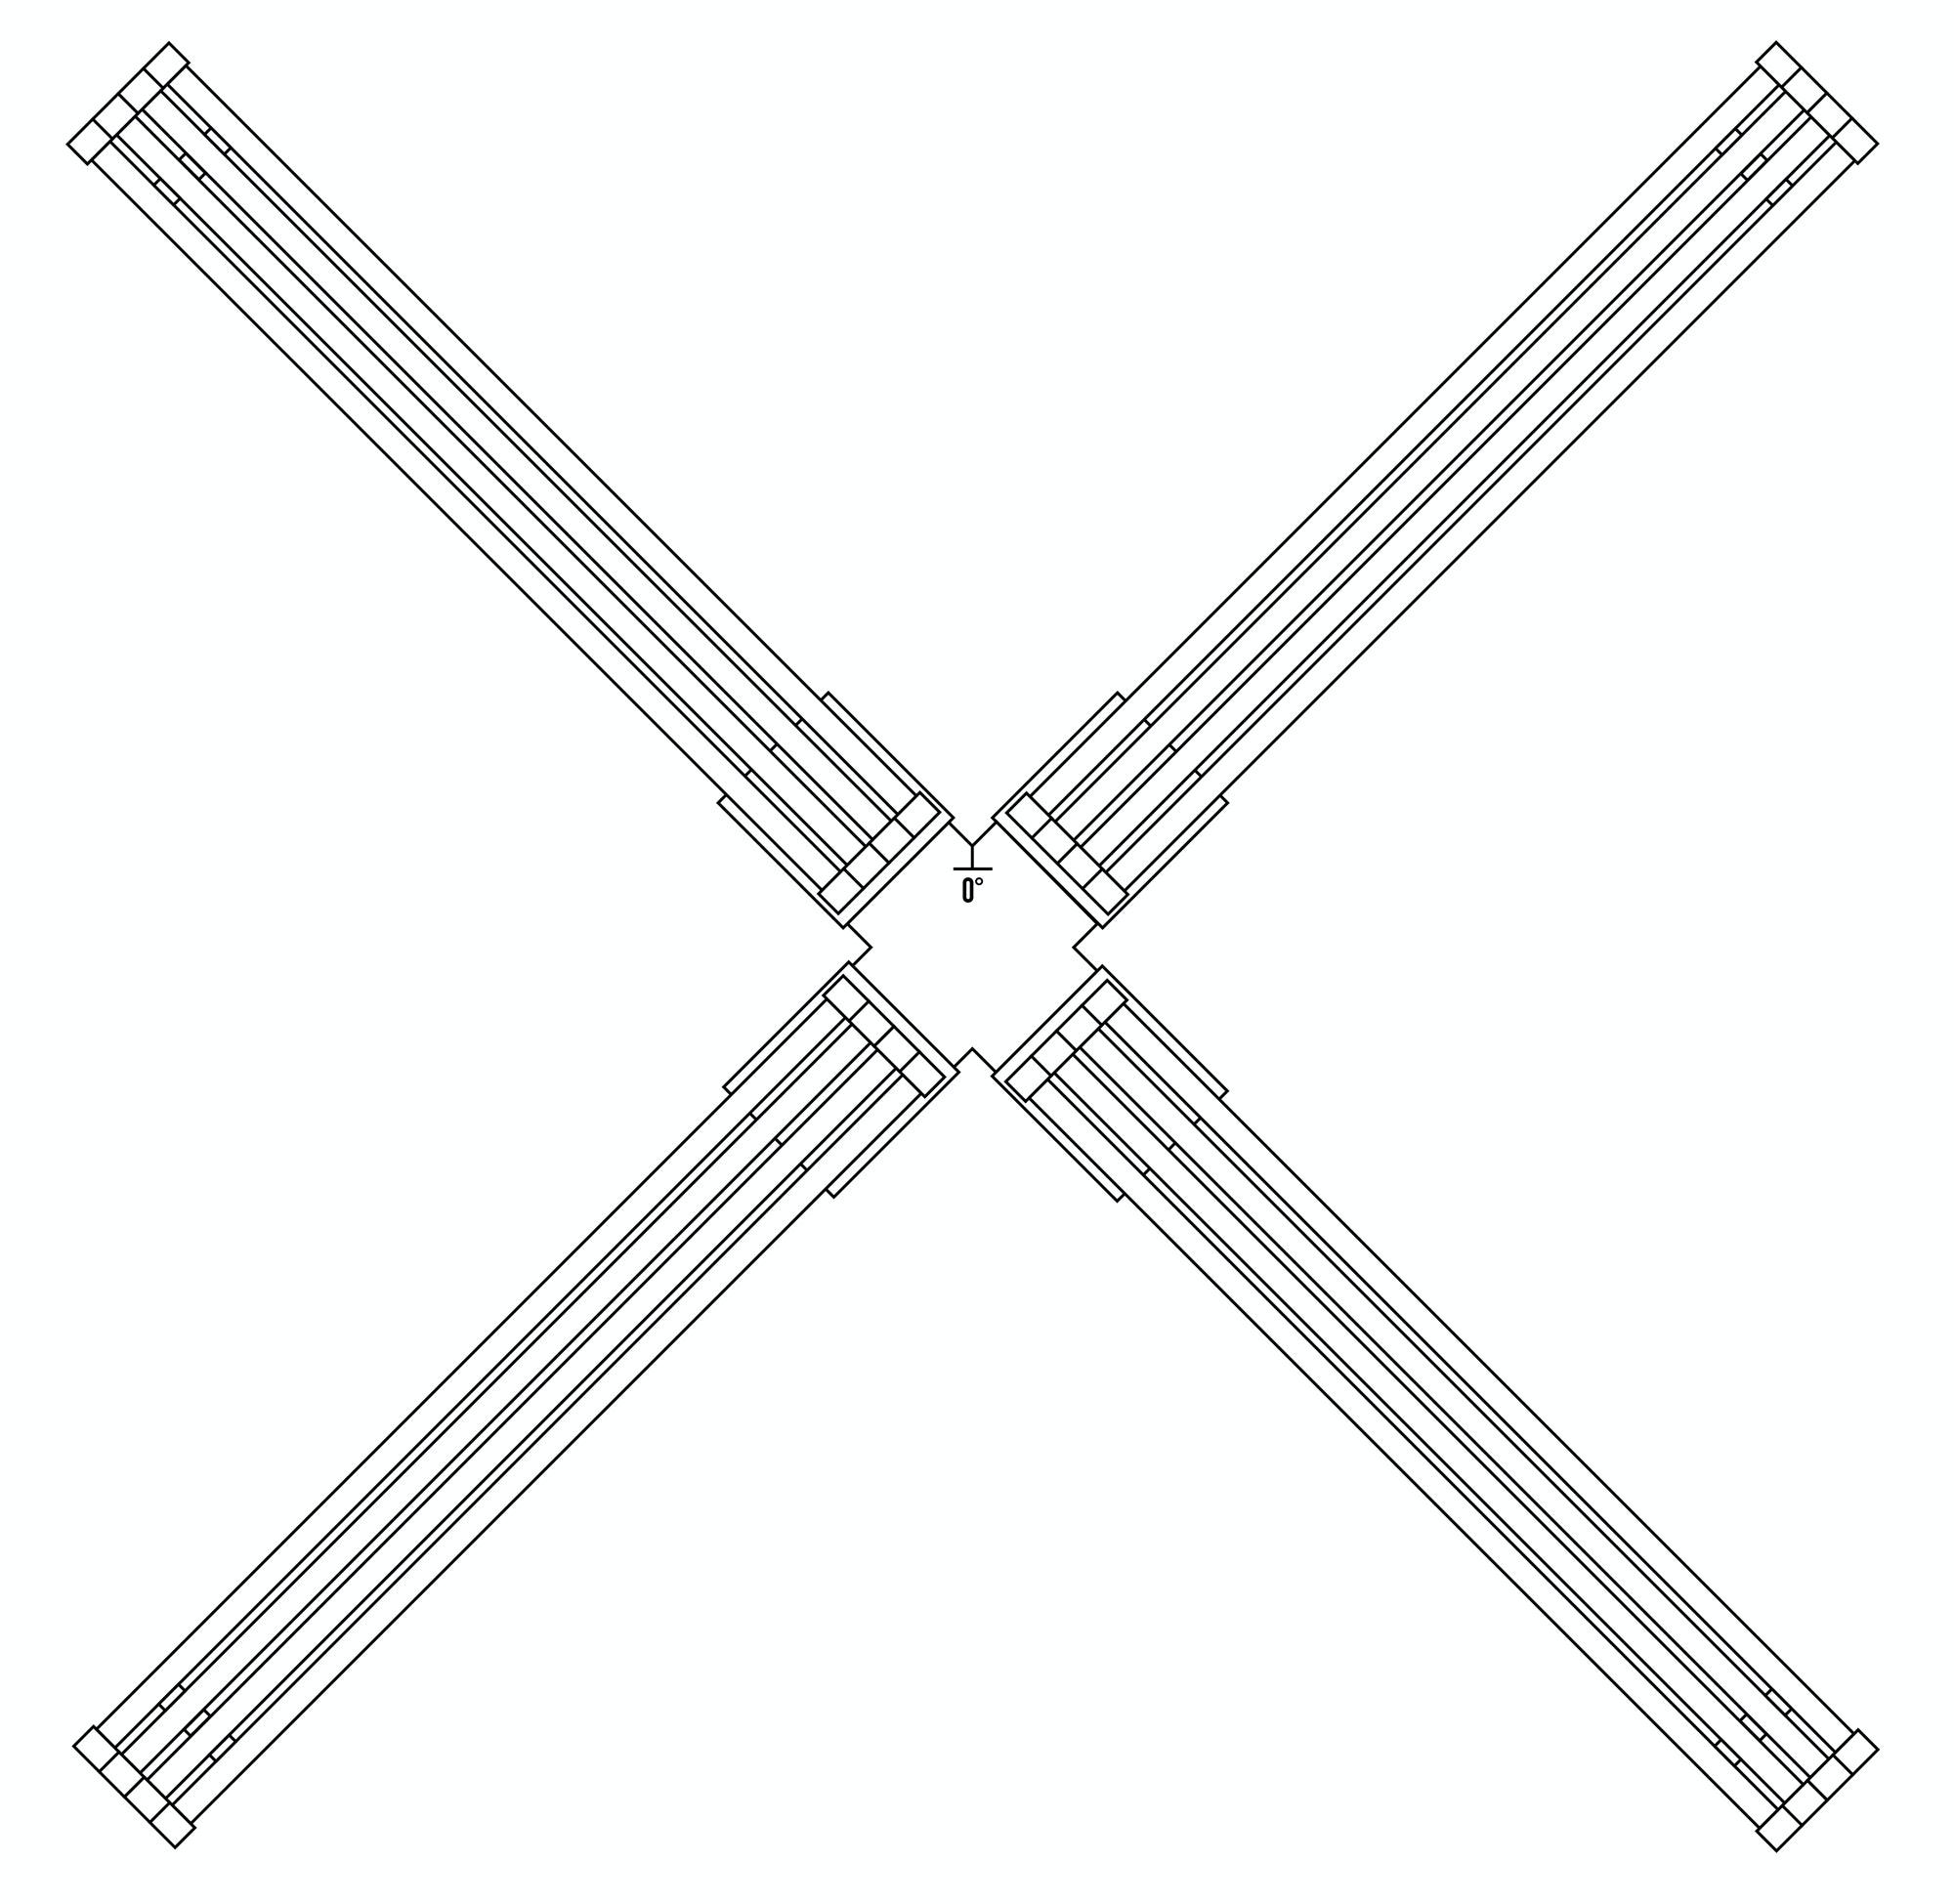 Sebastian Wanke, Neon, X, Diplom, Weimar